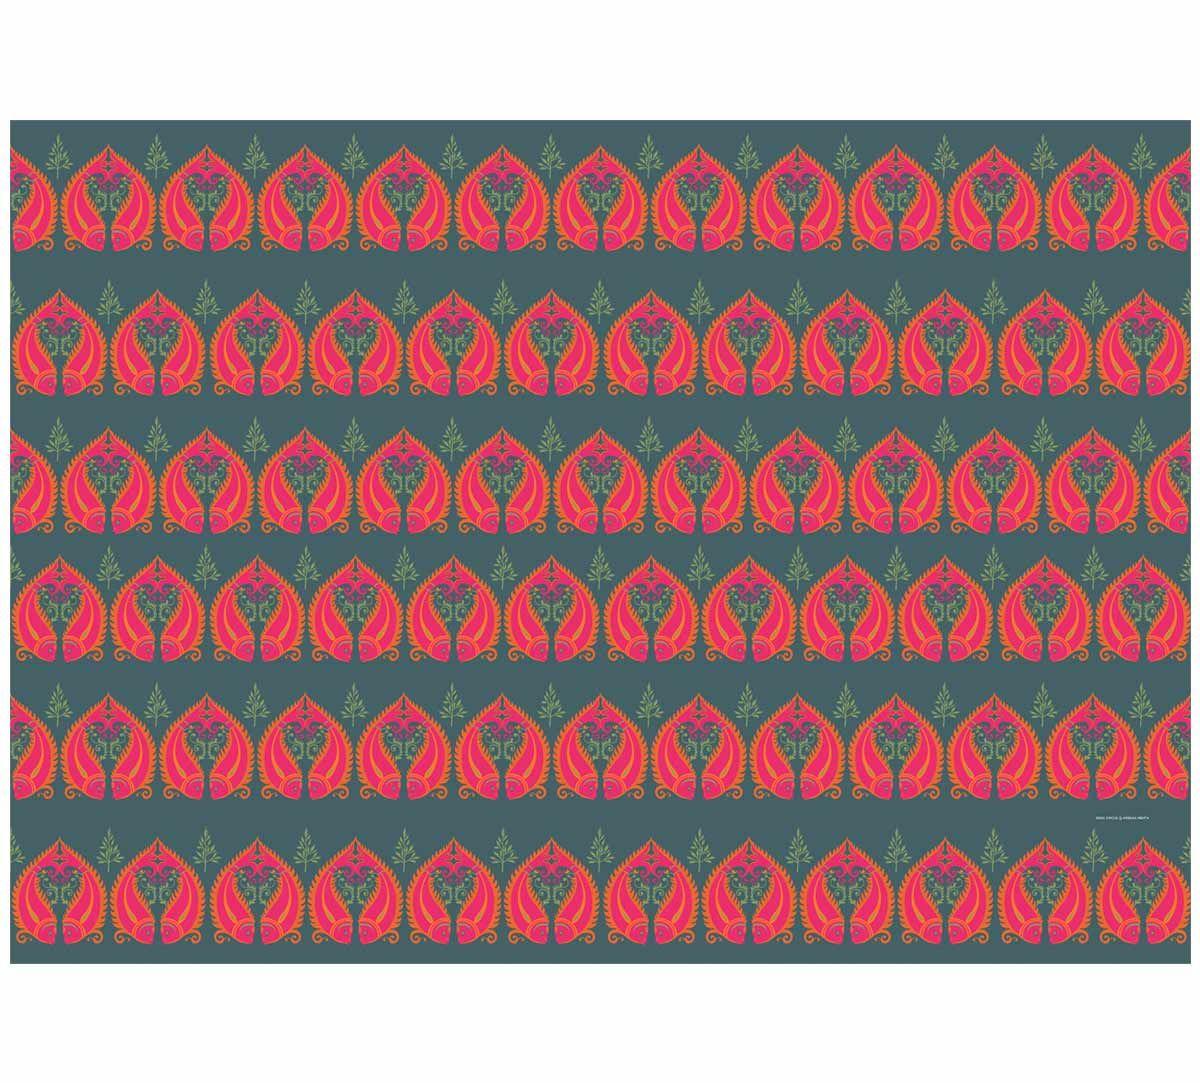 India Circus Fuchsia Fish Romance Gift Wrapping Paper